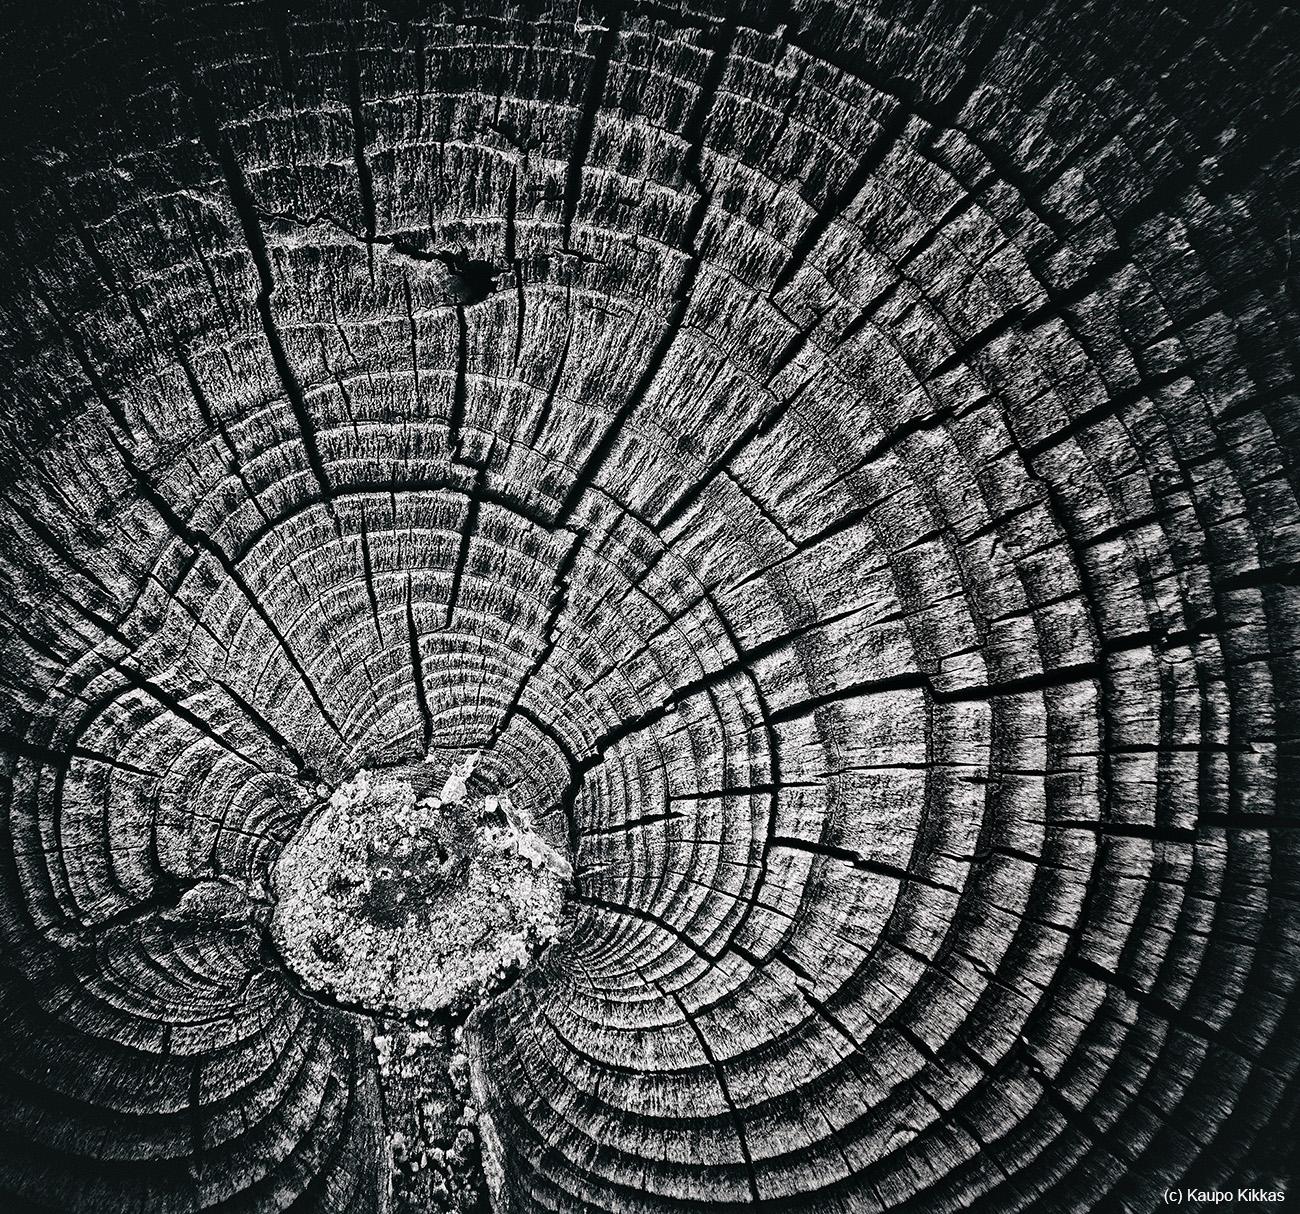 ins_kaupo_kikkas_heart_of_the_tree.jpg